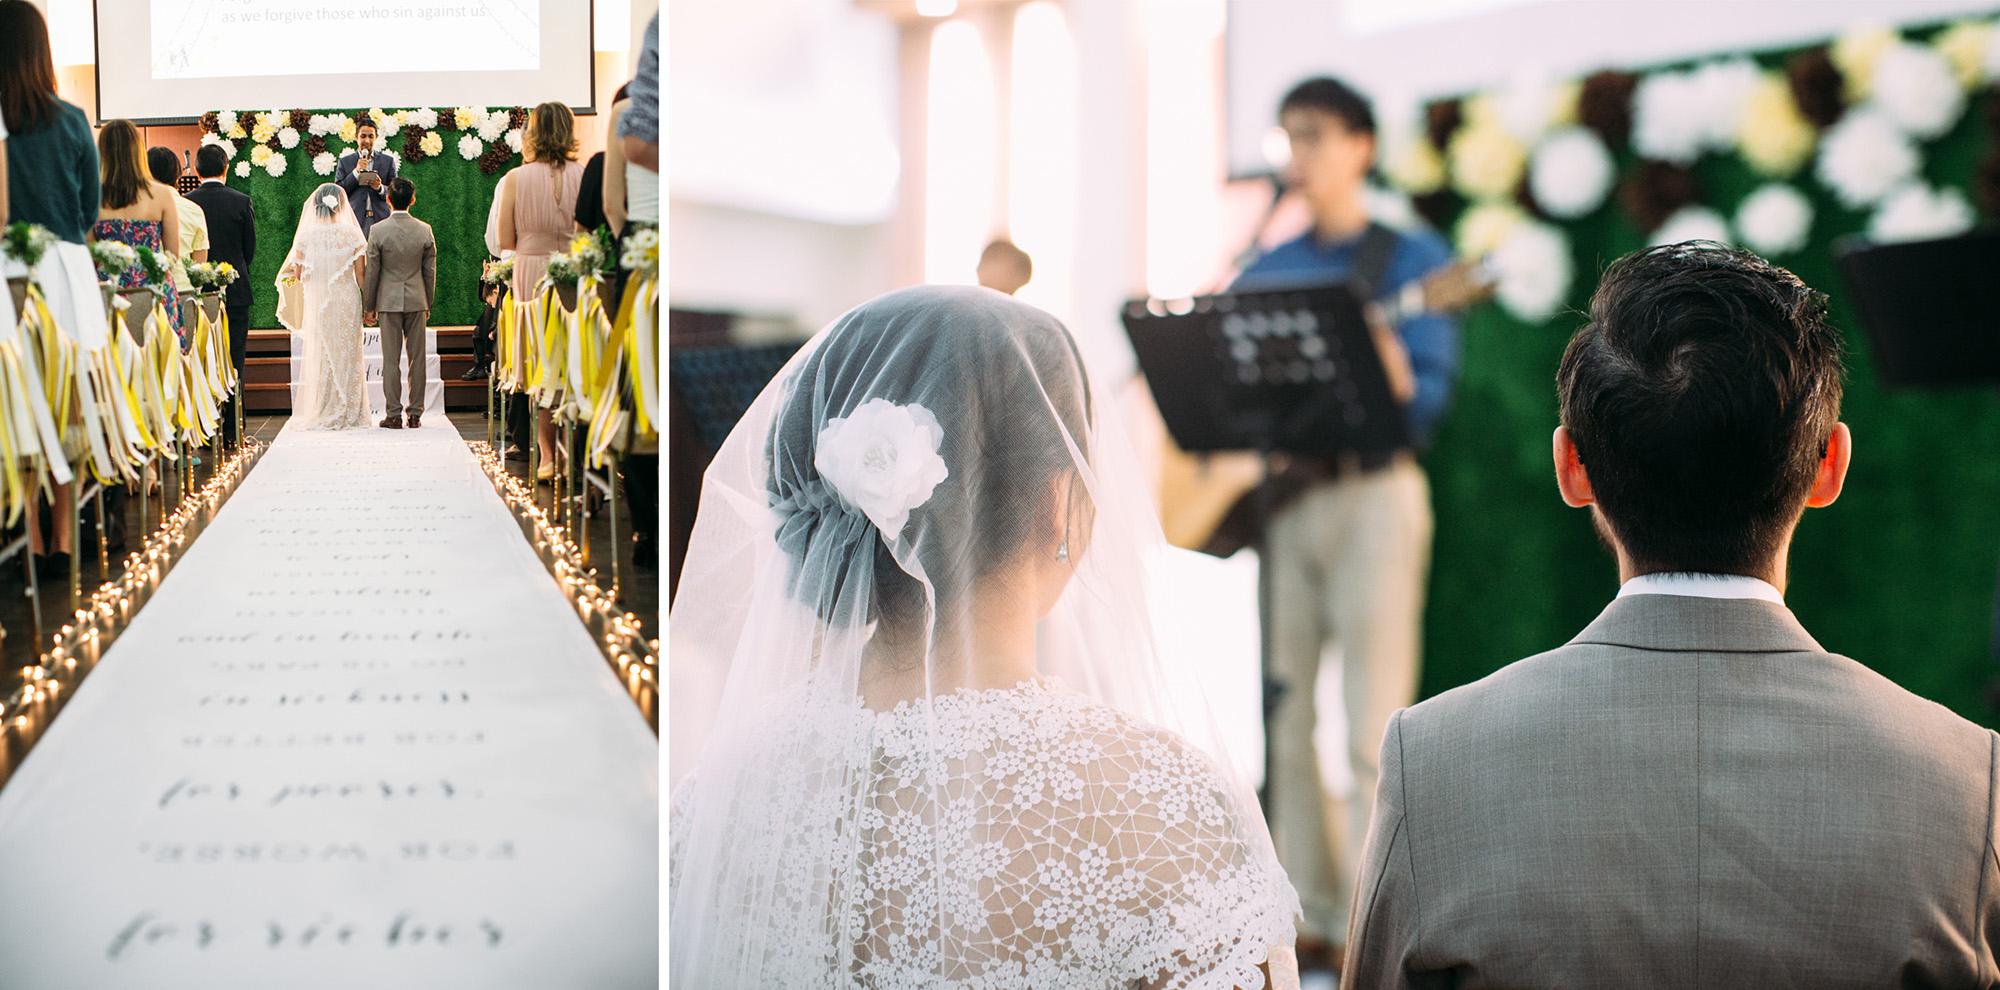 48-hellojanelee-sam grace-malaysia-wedding-day